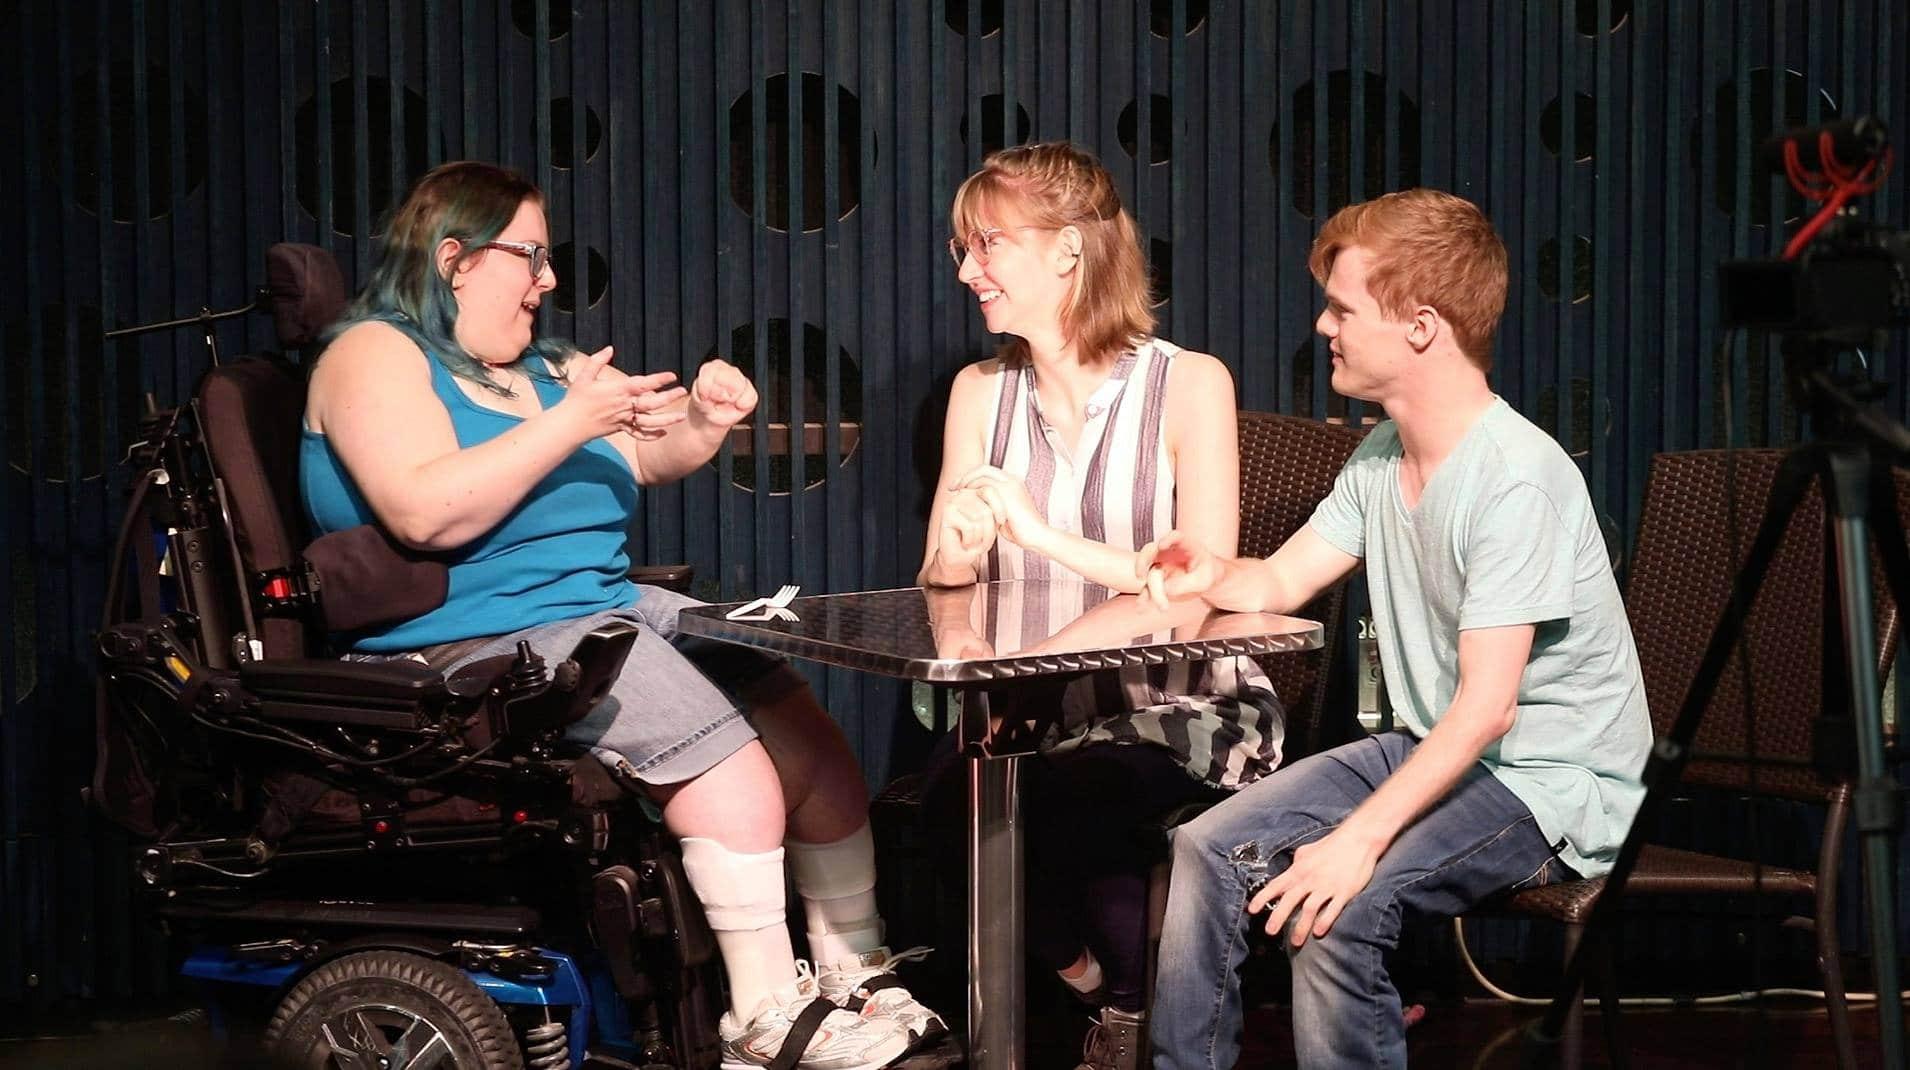 Photo: Actors perform a scene during the 2019 TFA Training Program